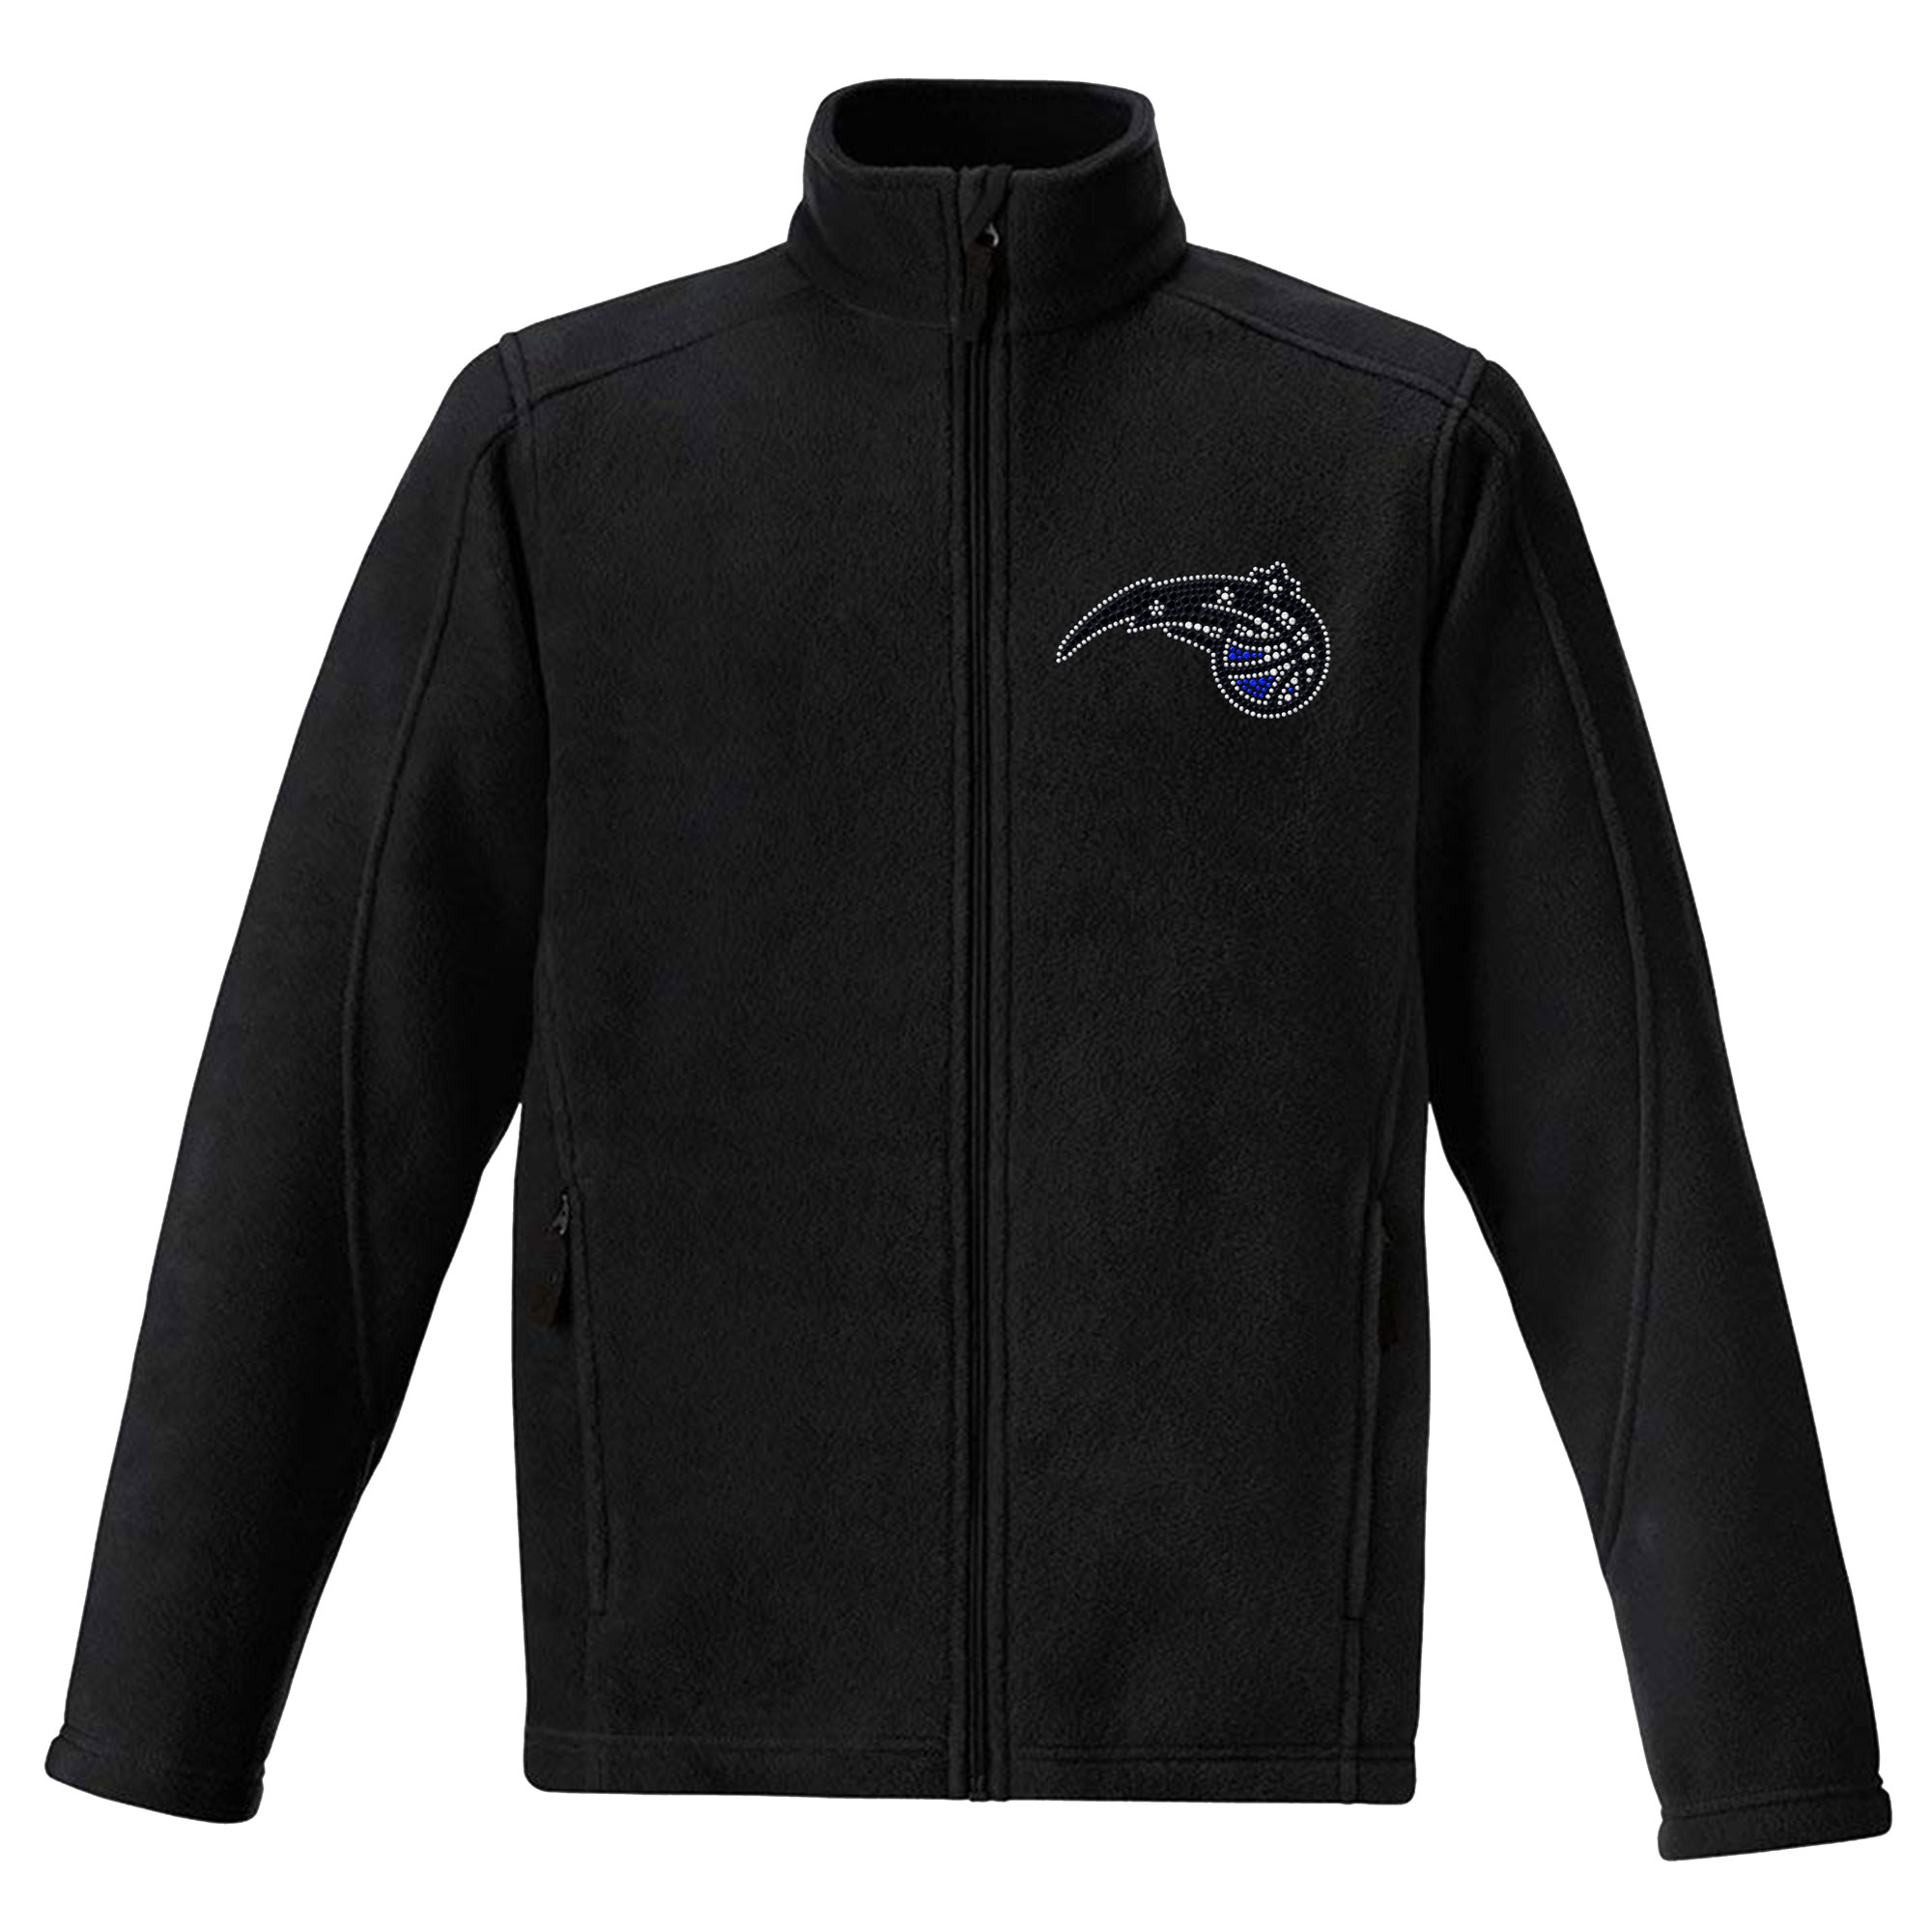 Orlando Magic Women's Rhinestone Full-Zip Fleece Jacket - Black